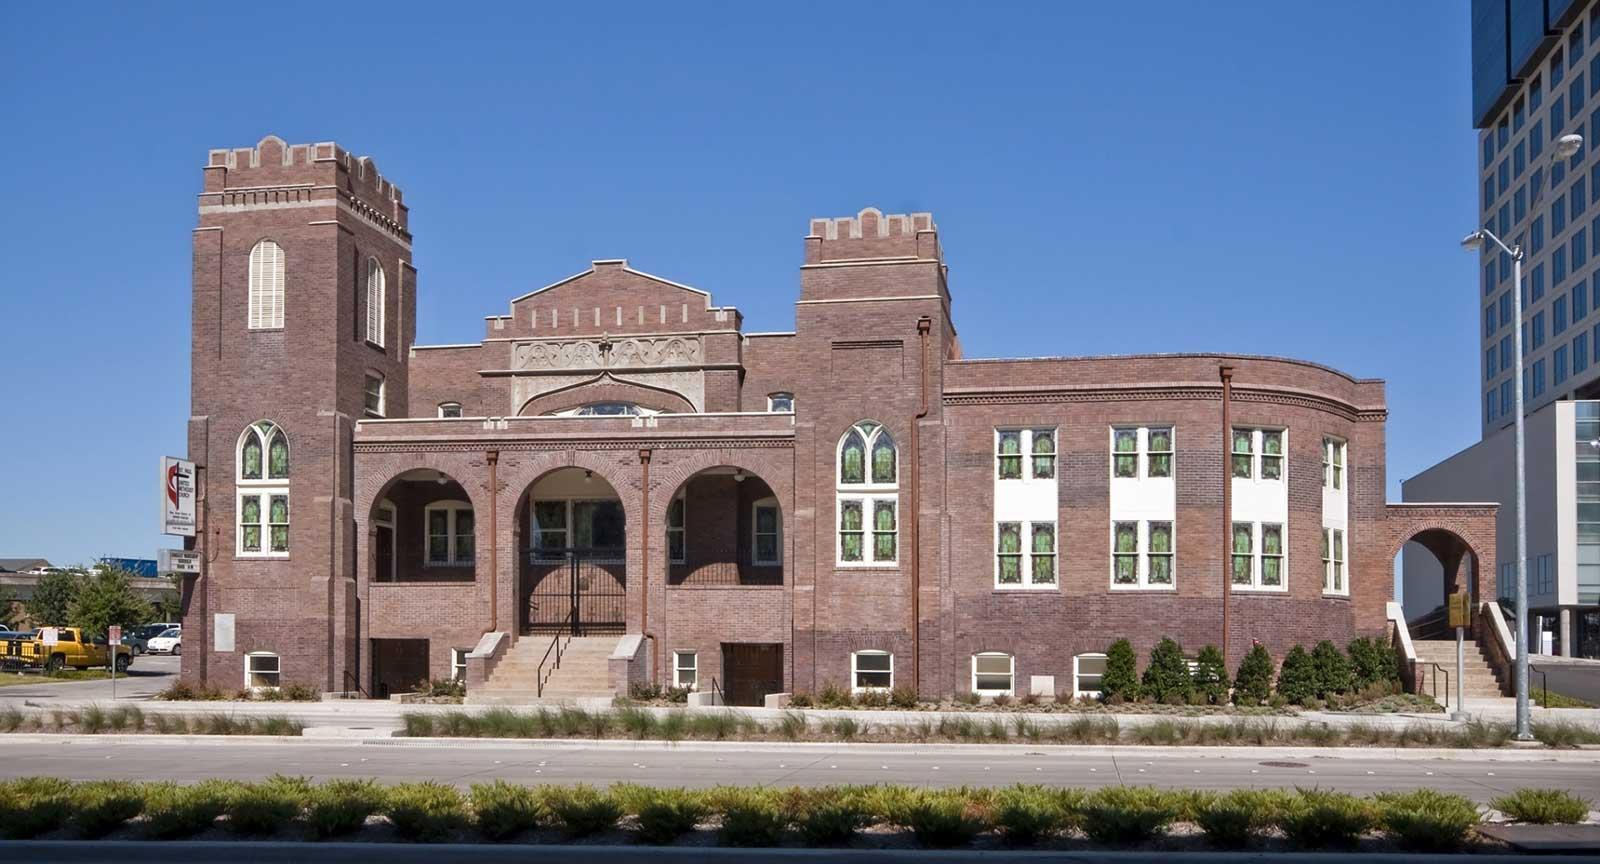 Dallas Arts District St. Paul United Methodist Exterior